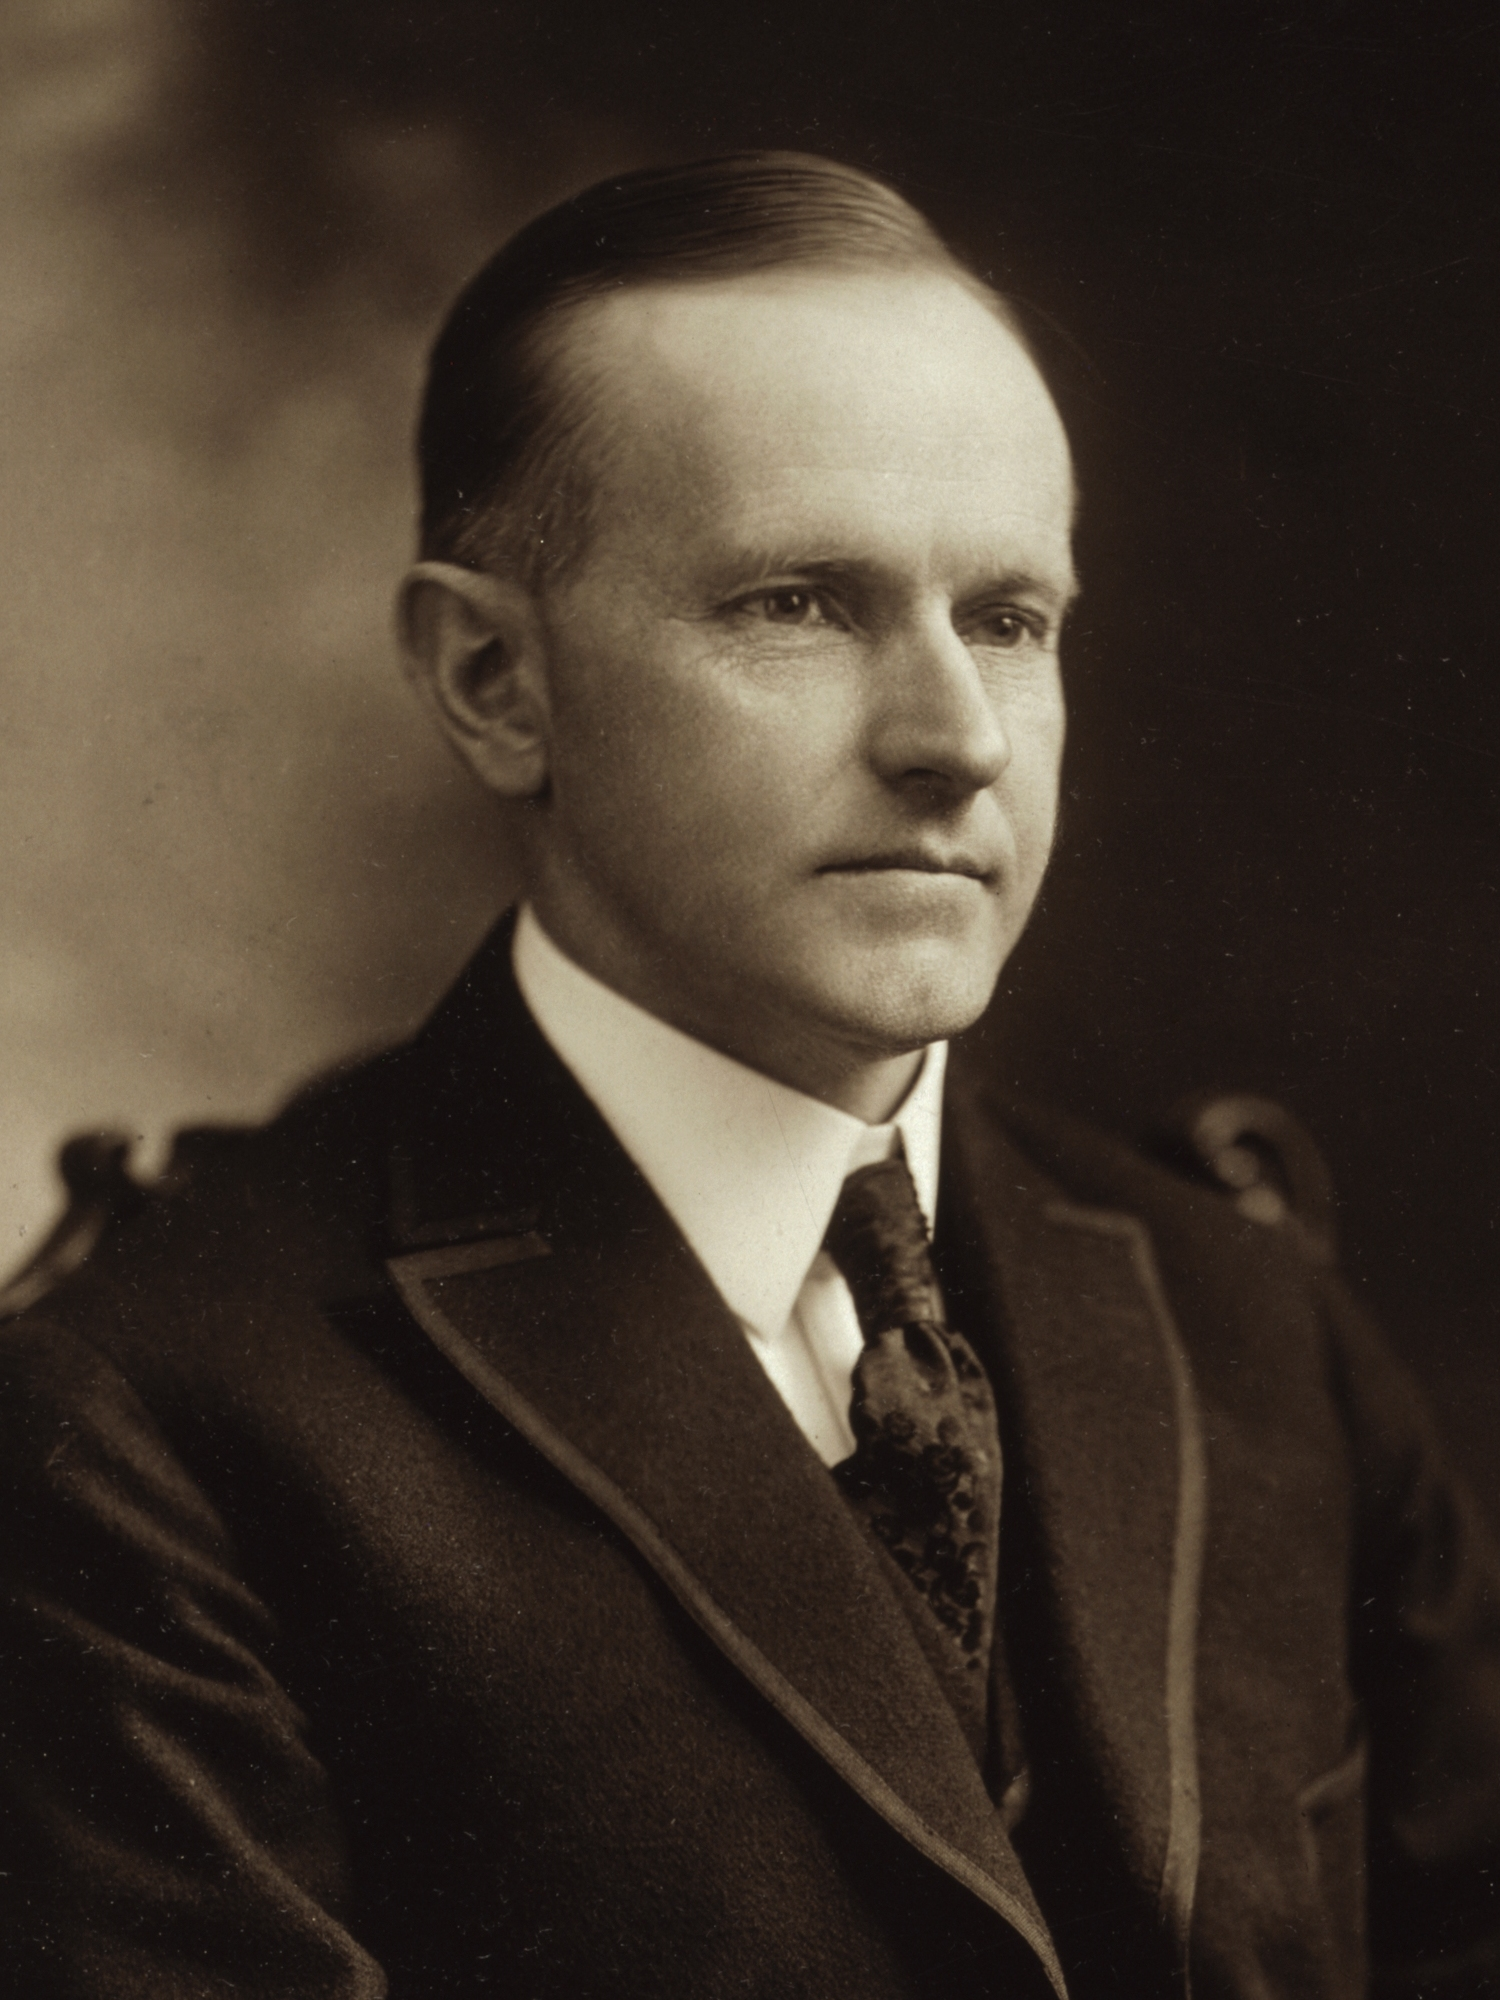 Coolidge administration